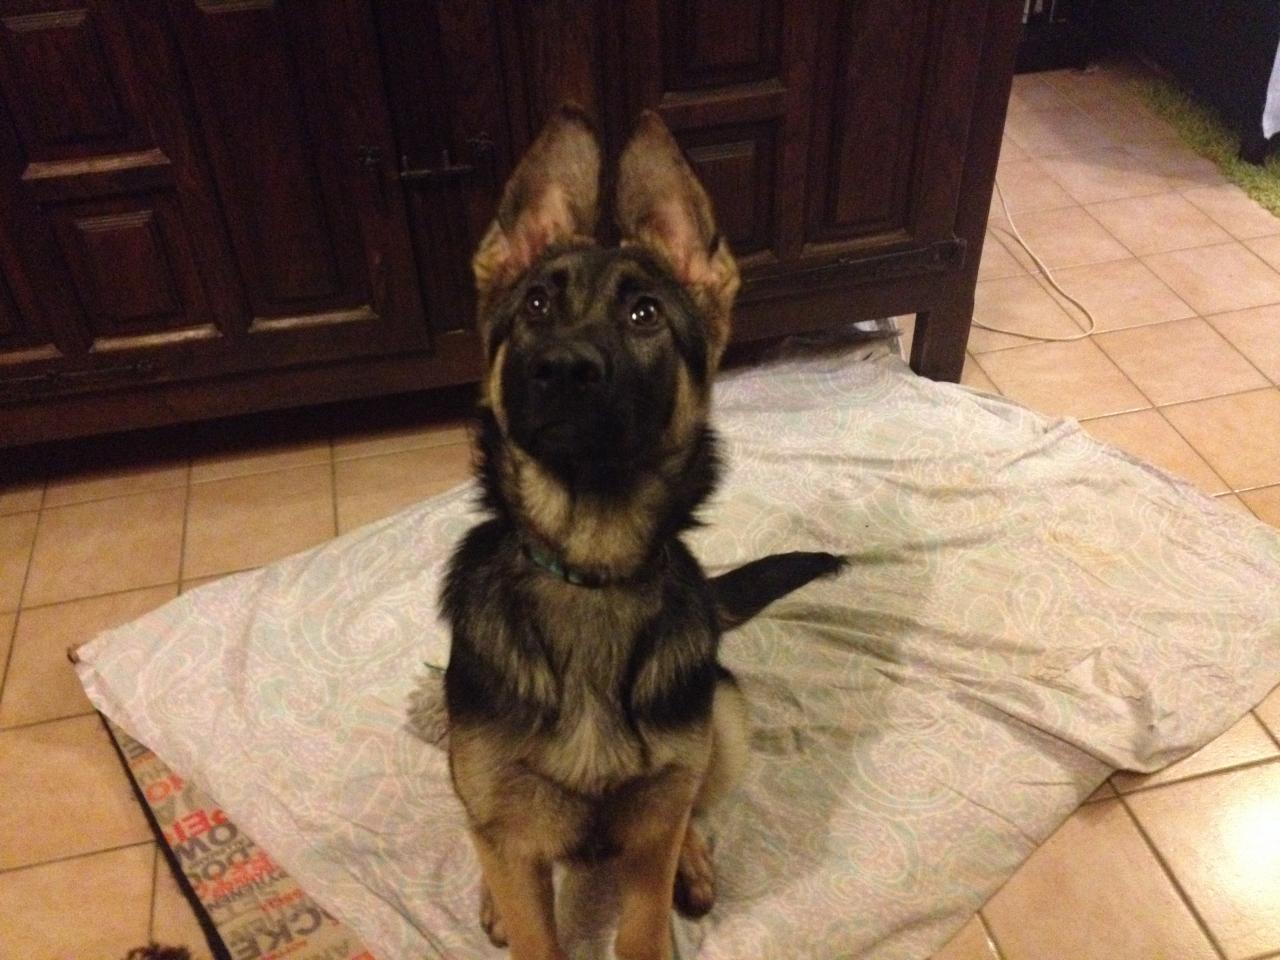 Misha, berger allemand de 6 mois